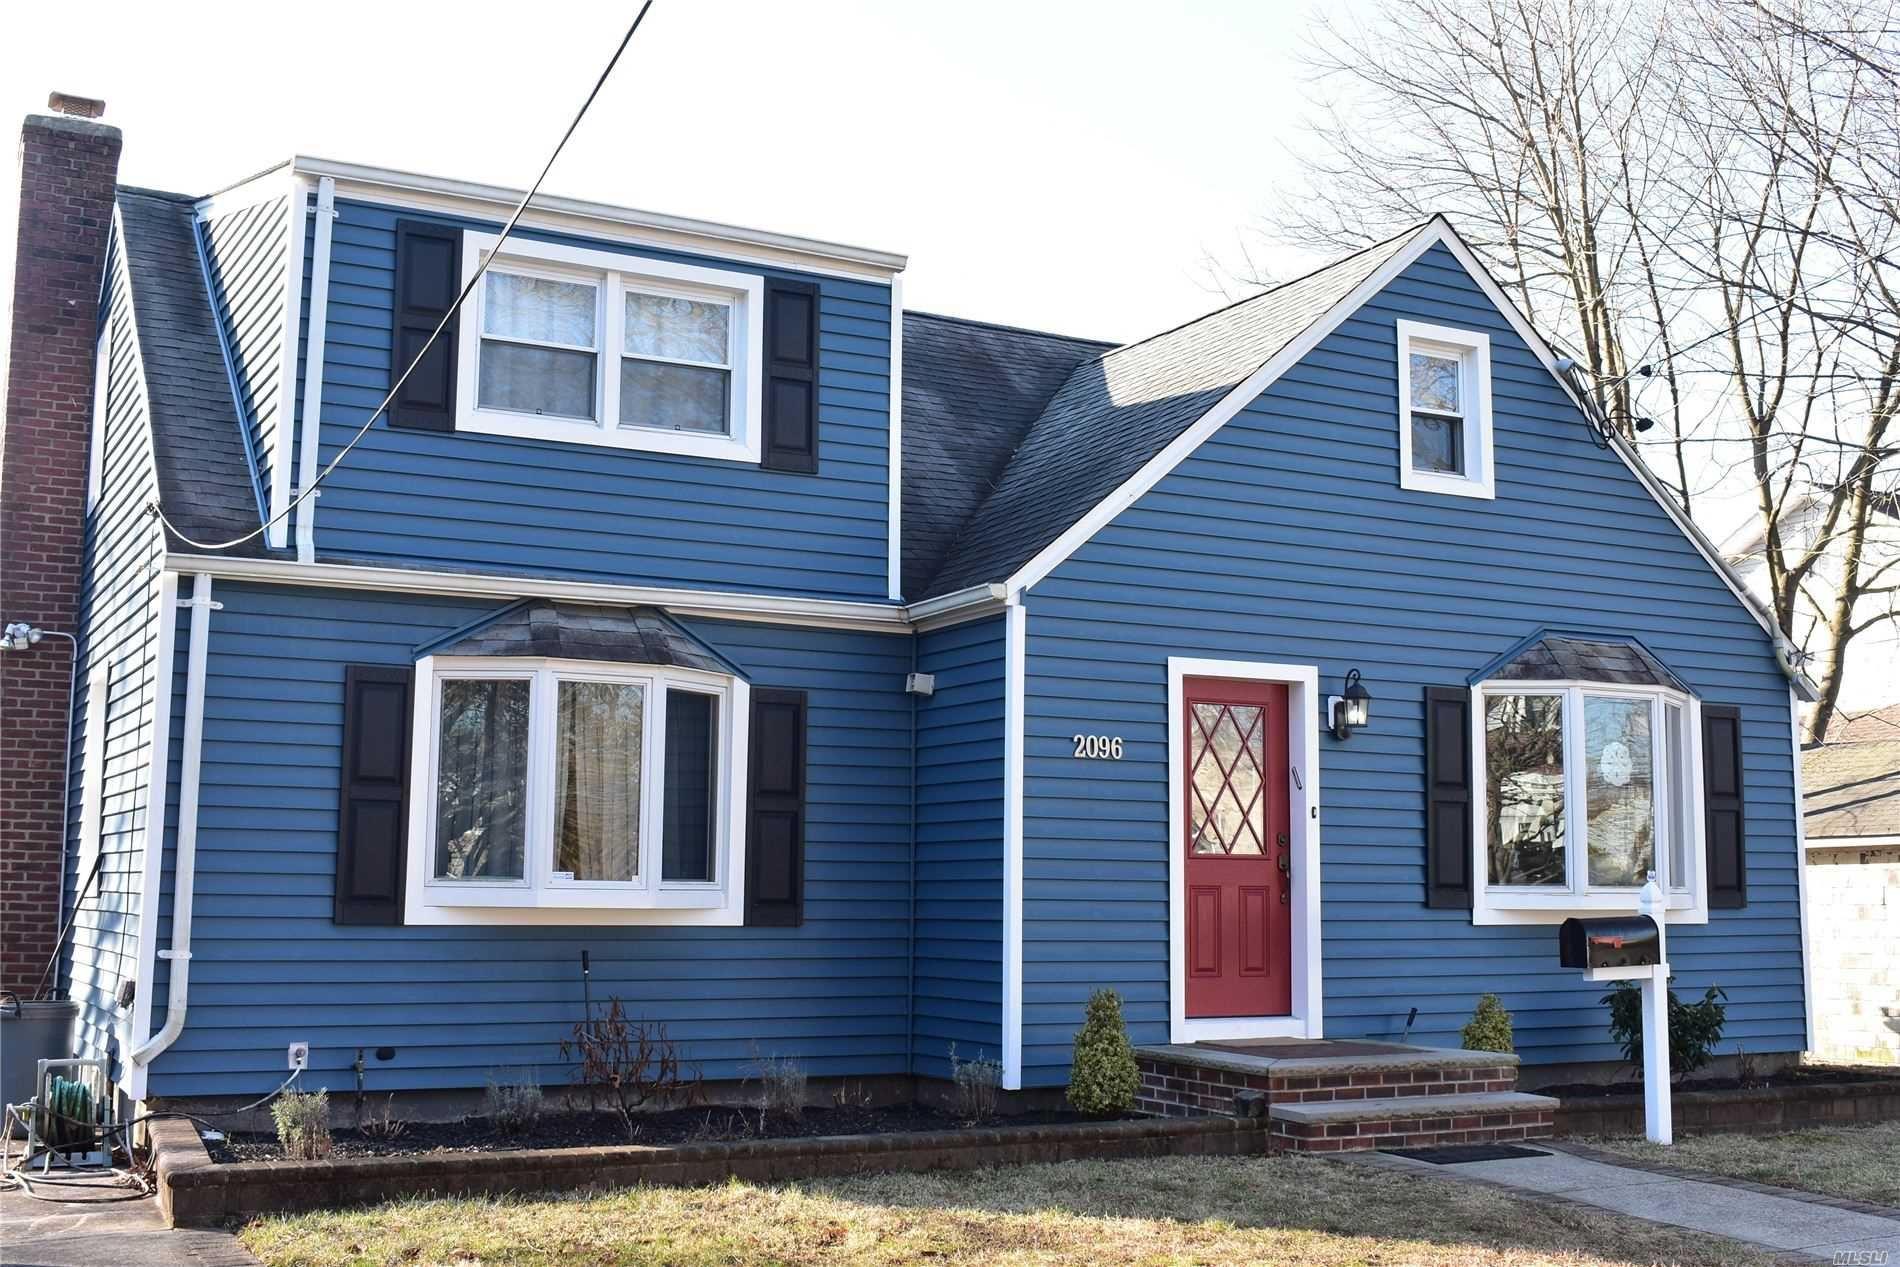 2096 William Place, Merrick, NY 11566 - MLS#: 3202221